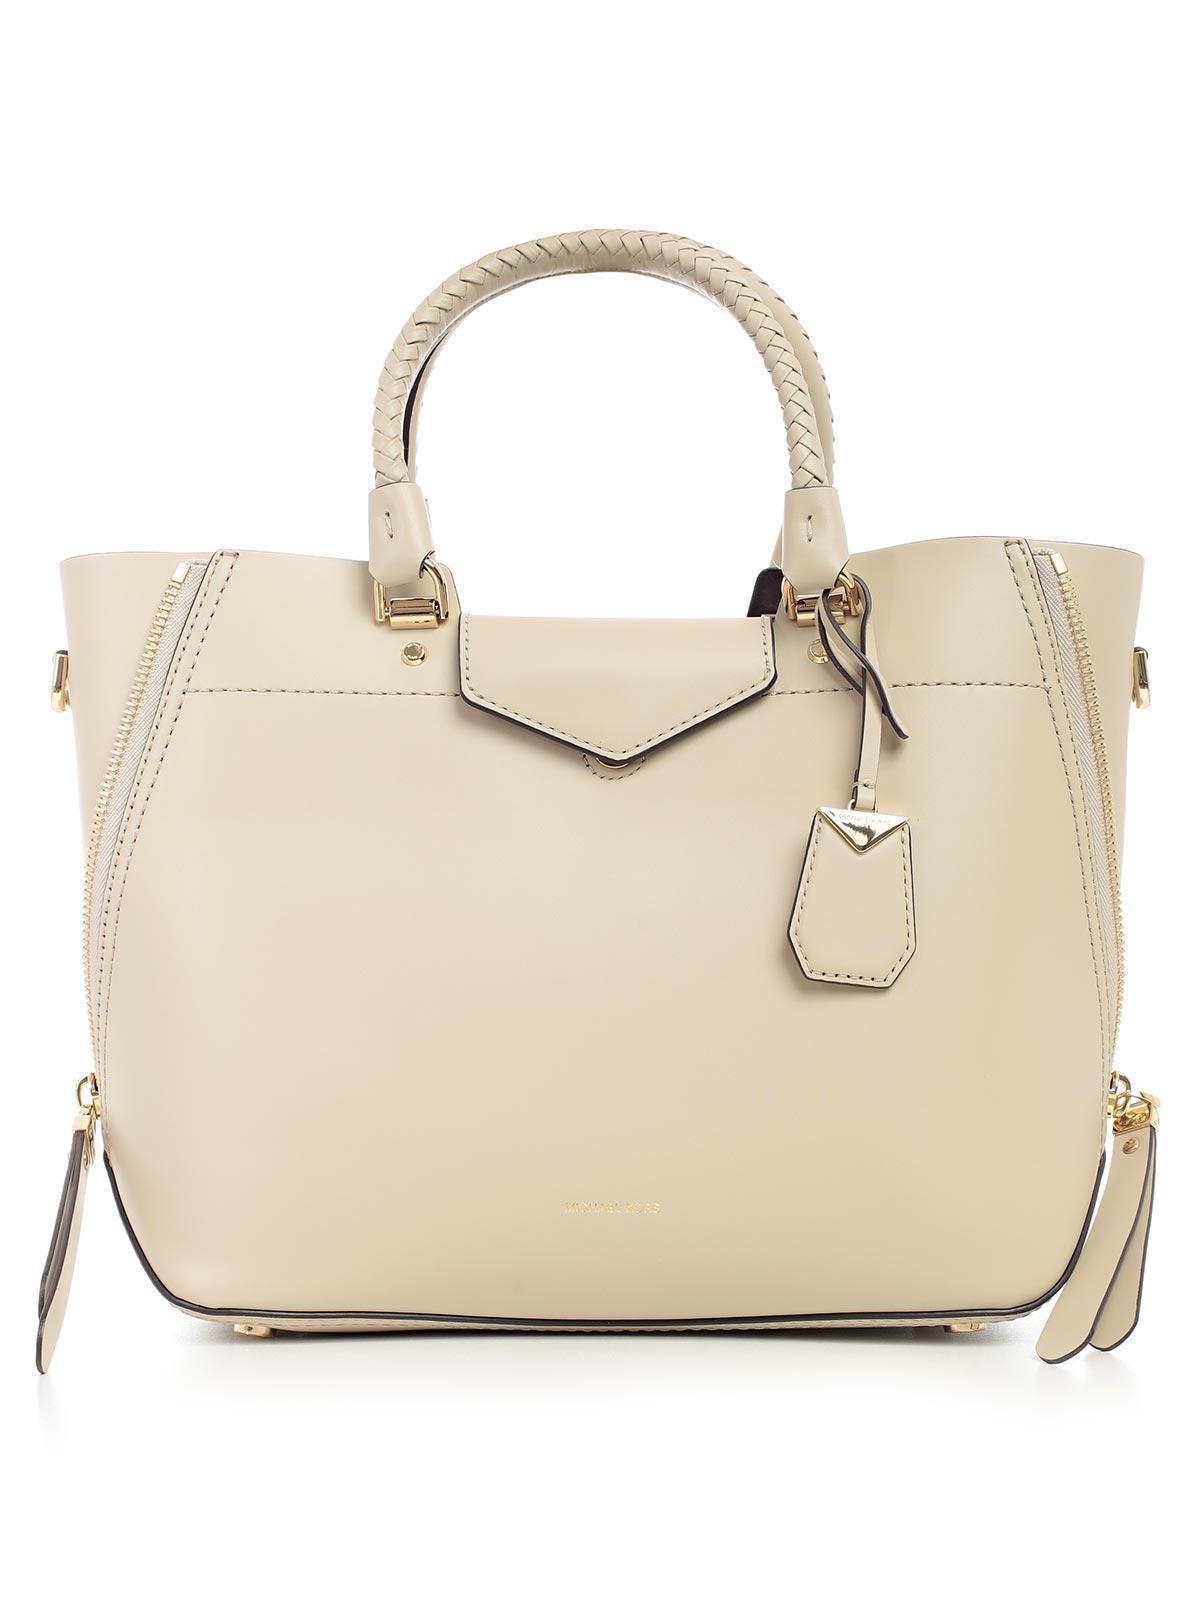 Blakely Large Tote Bag in Oat Viola Leather Michael Michael Kors rdDmwQp4q5